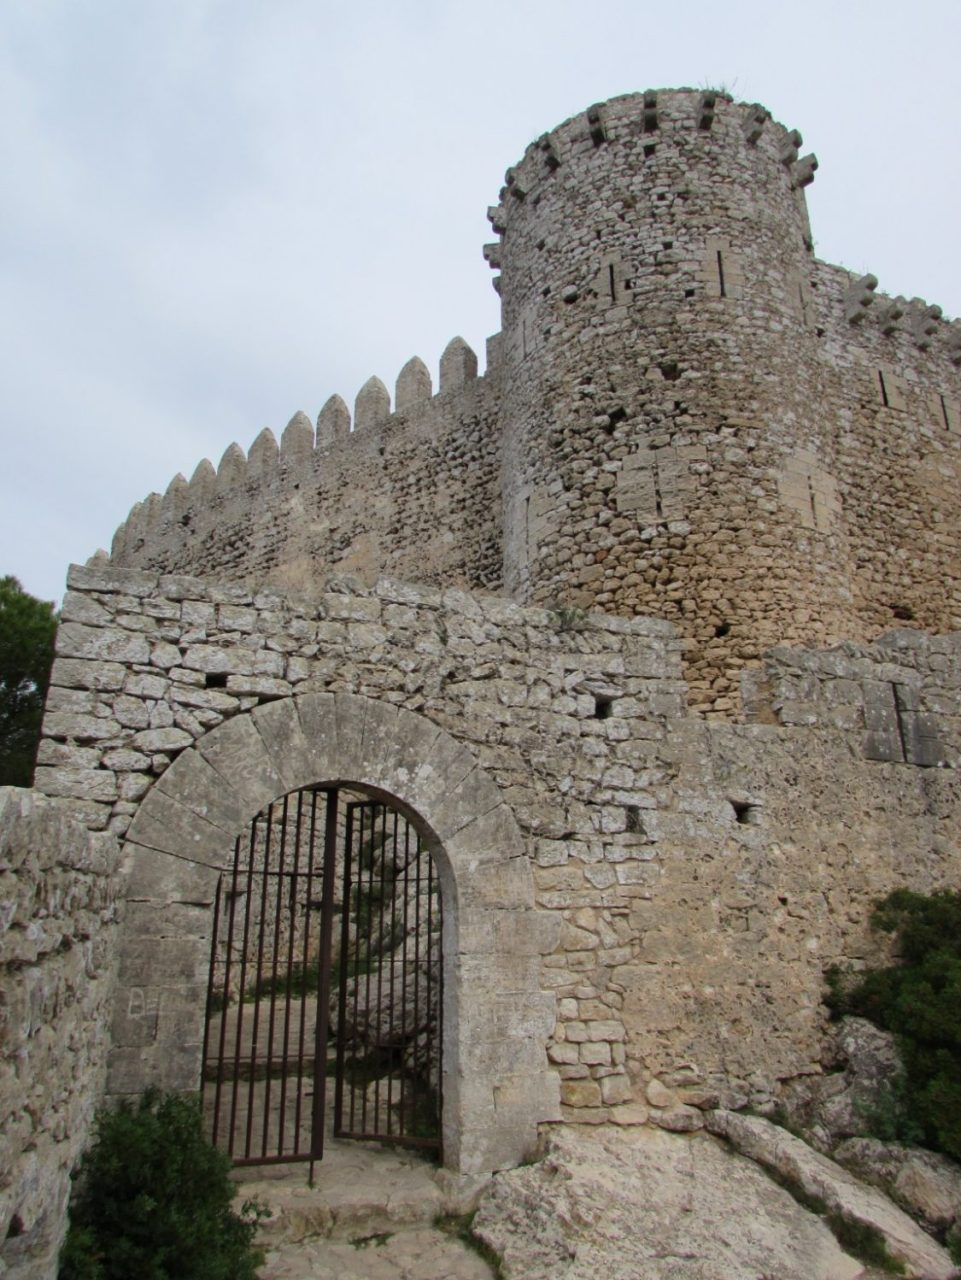 Castillo del rei, Santanyi. Castillos más bonitos de Mallorca